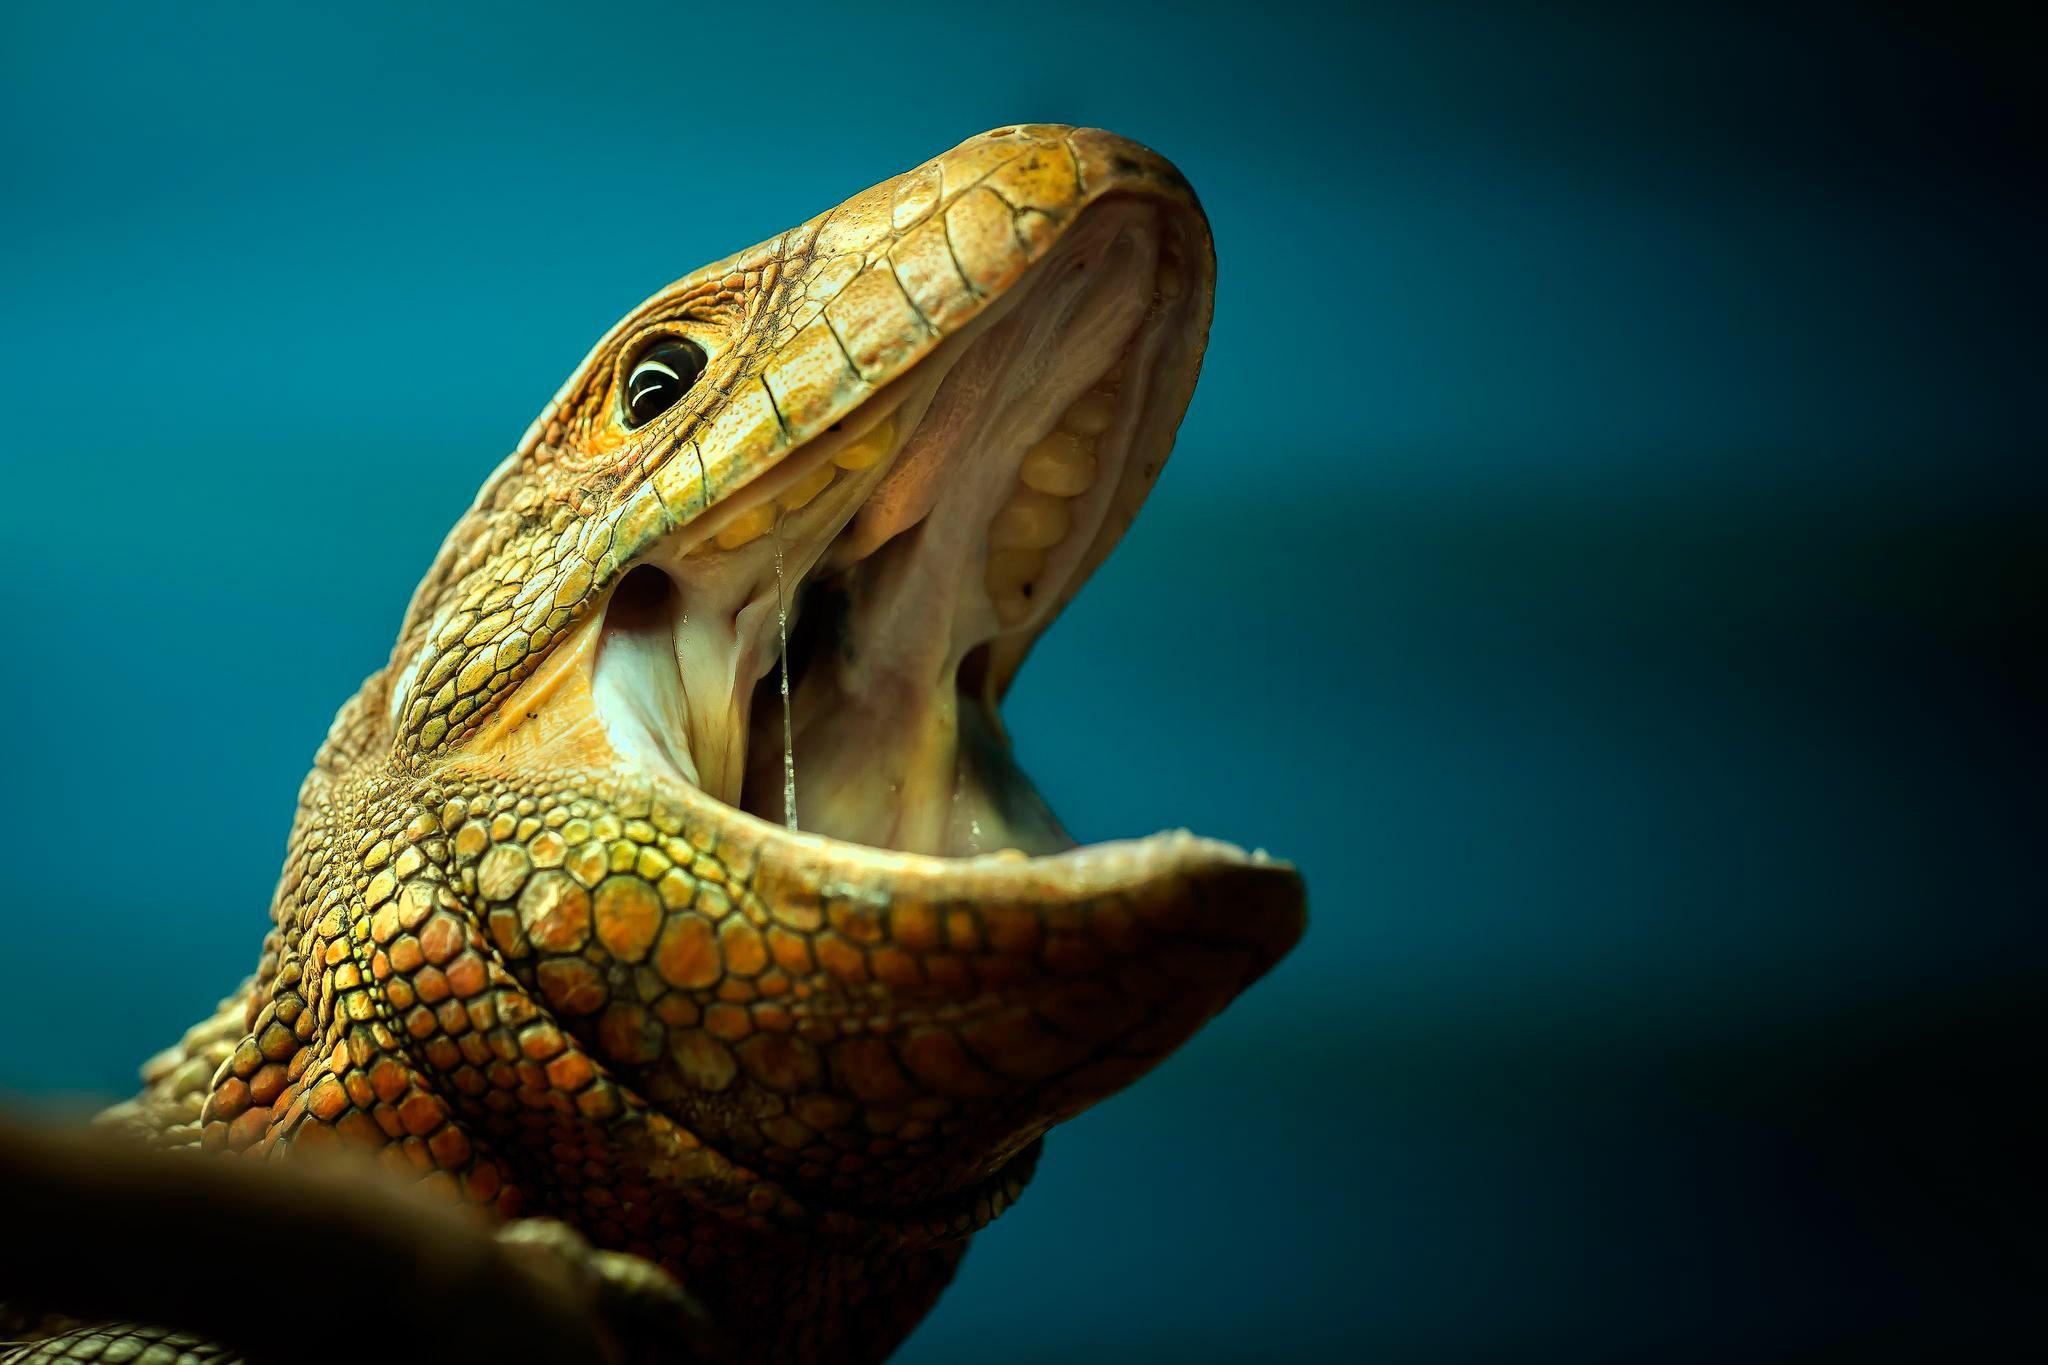 reptiles-amphibians-detlef-knapp-14